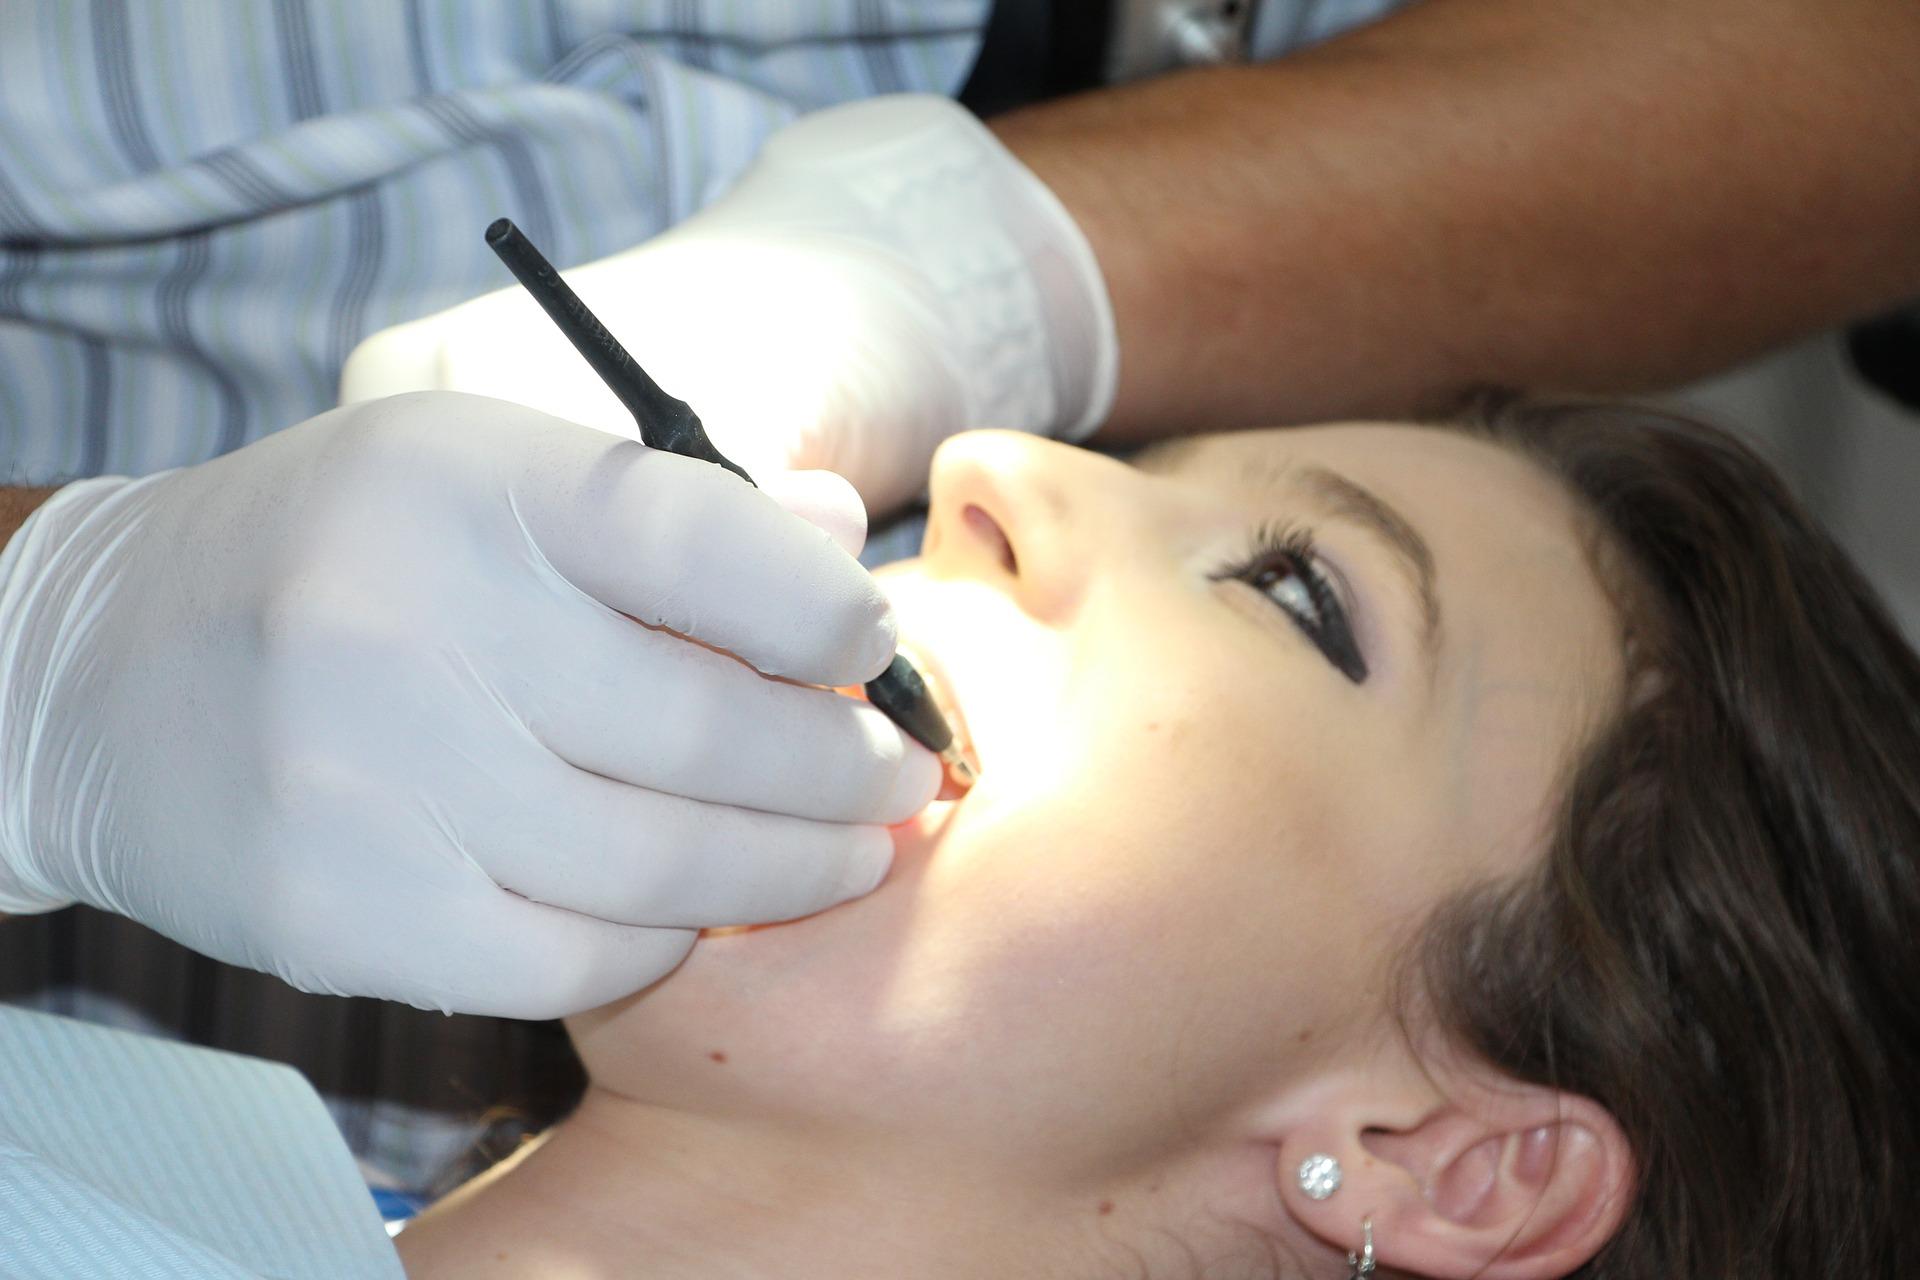 NHS dental negligence